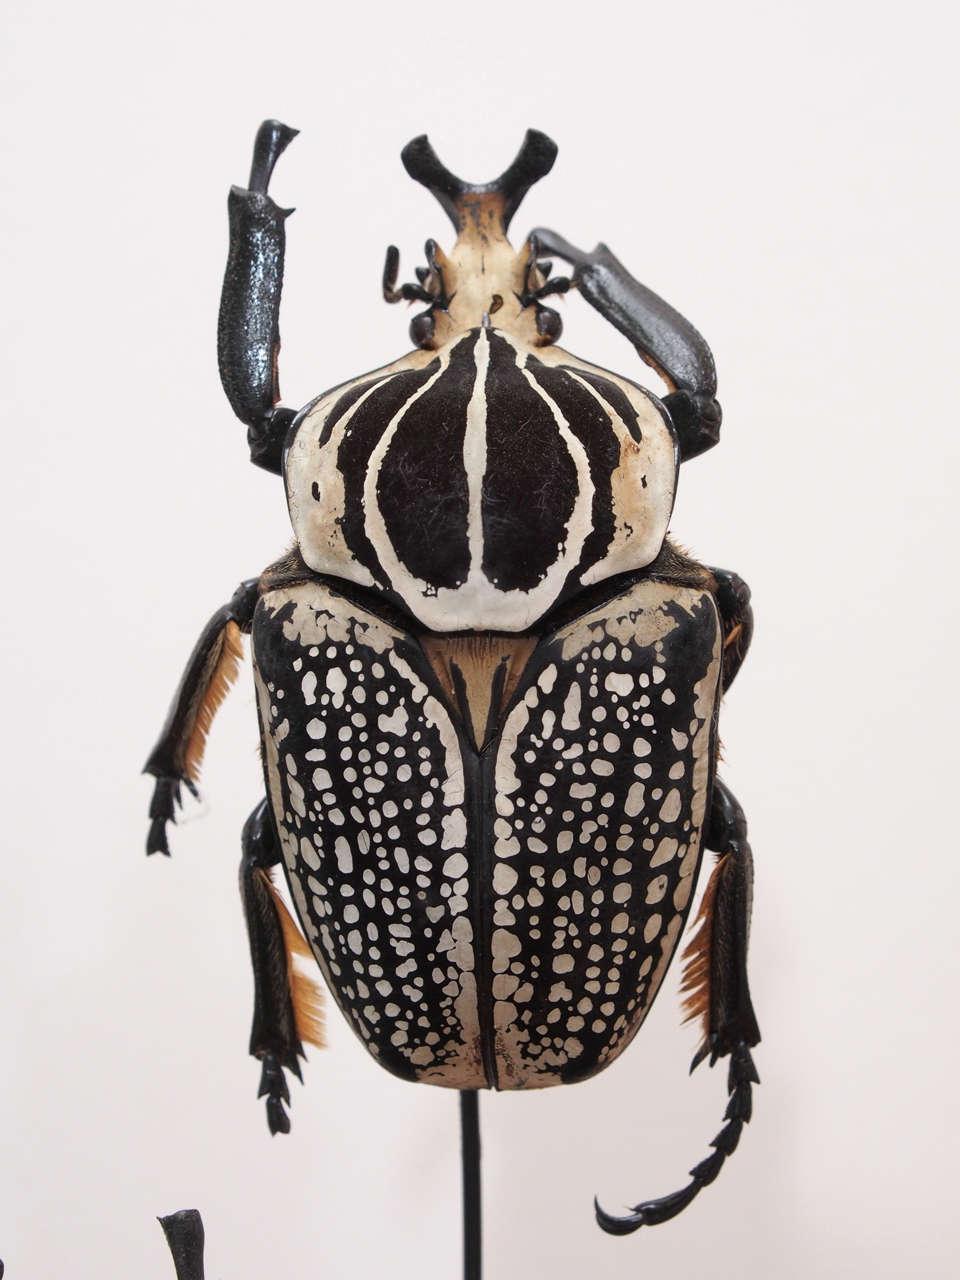 Specimen Beetles Under Glass Dome 3